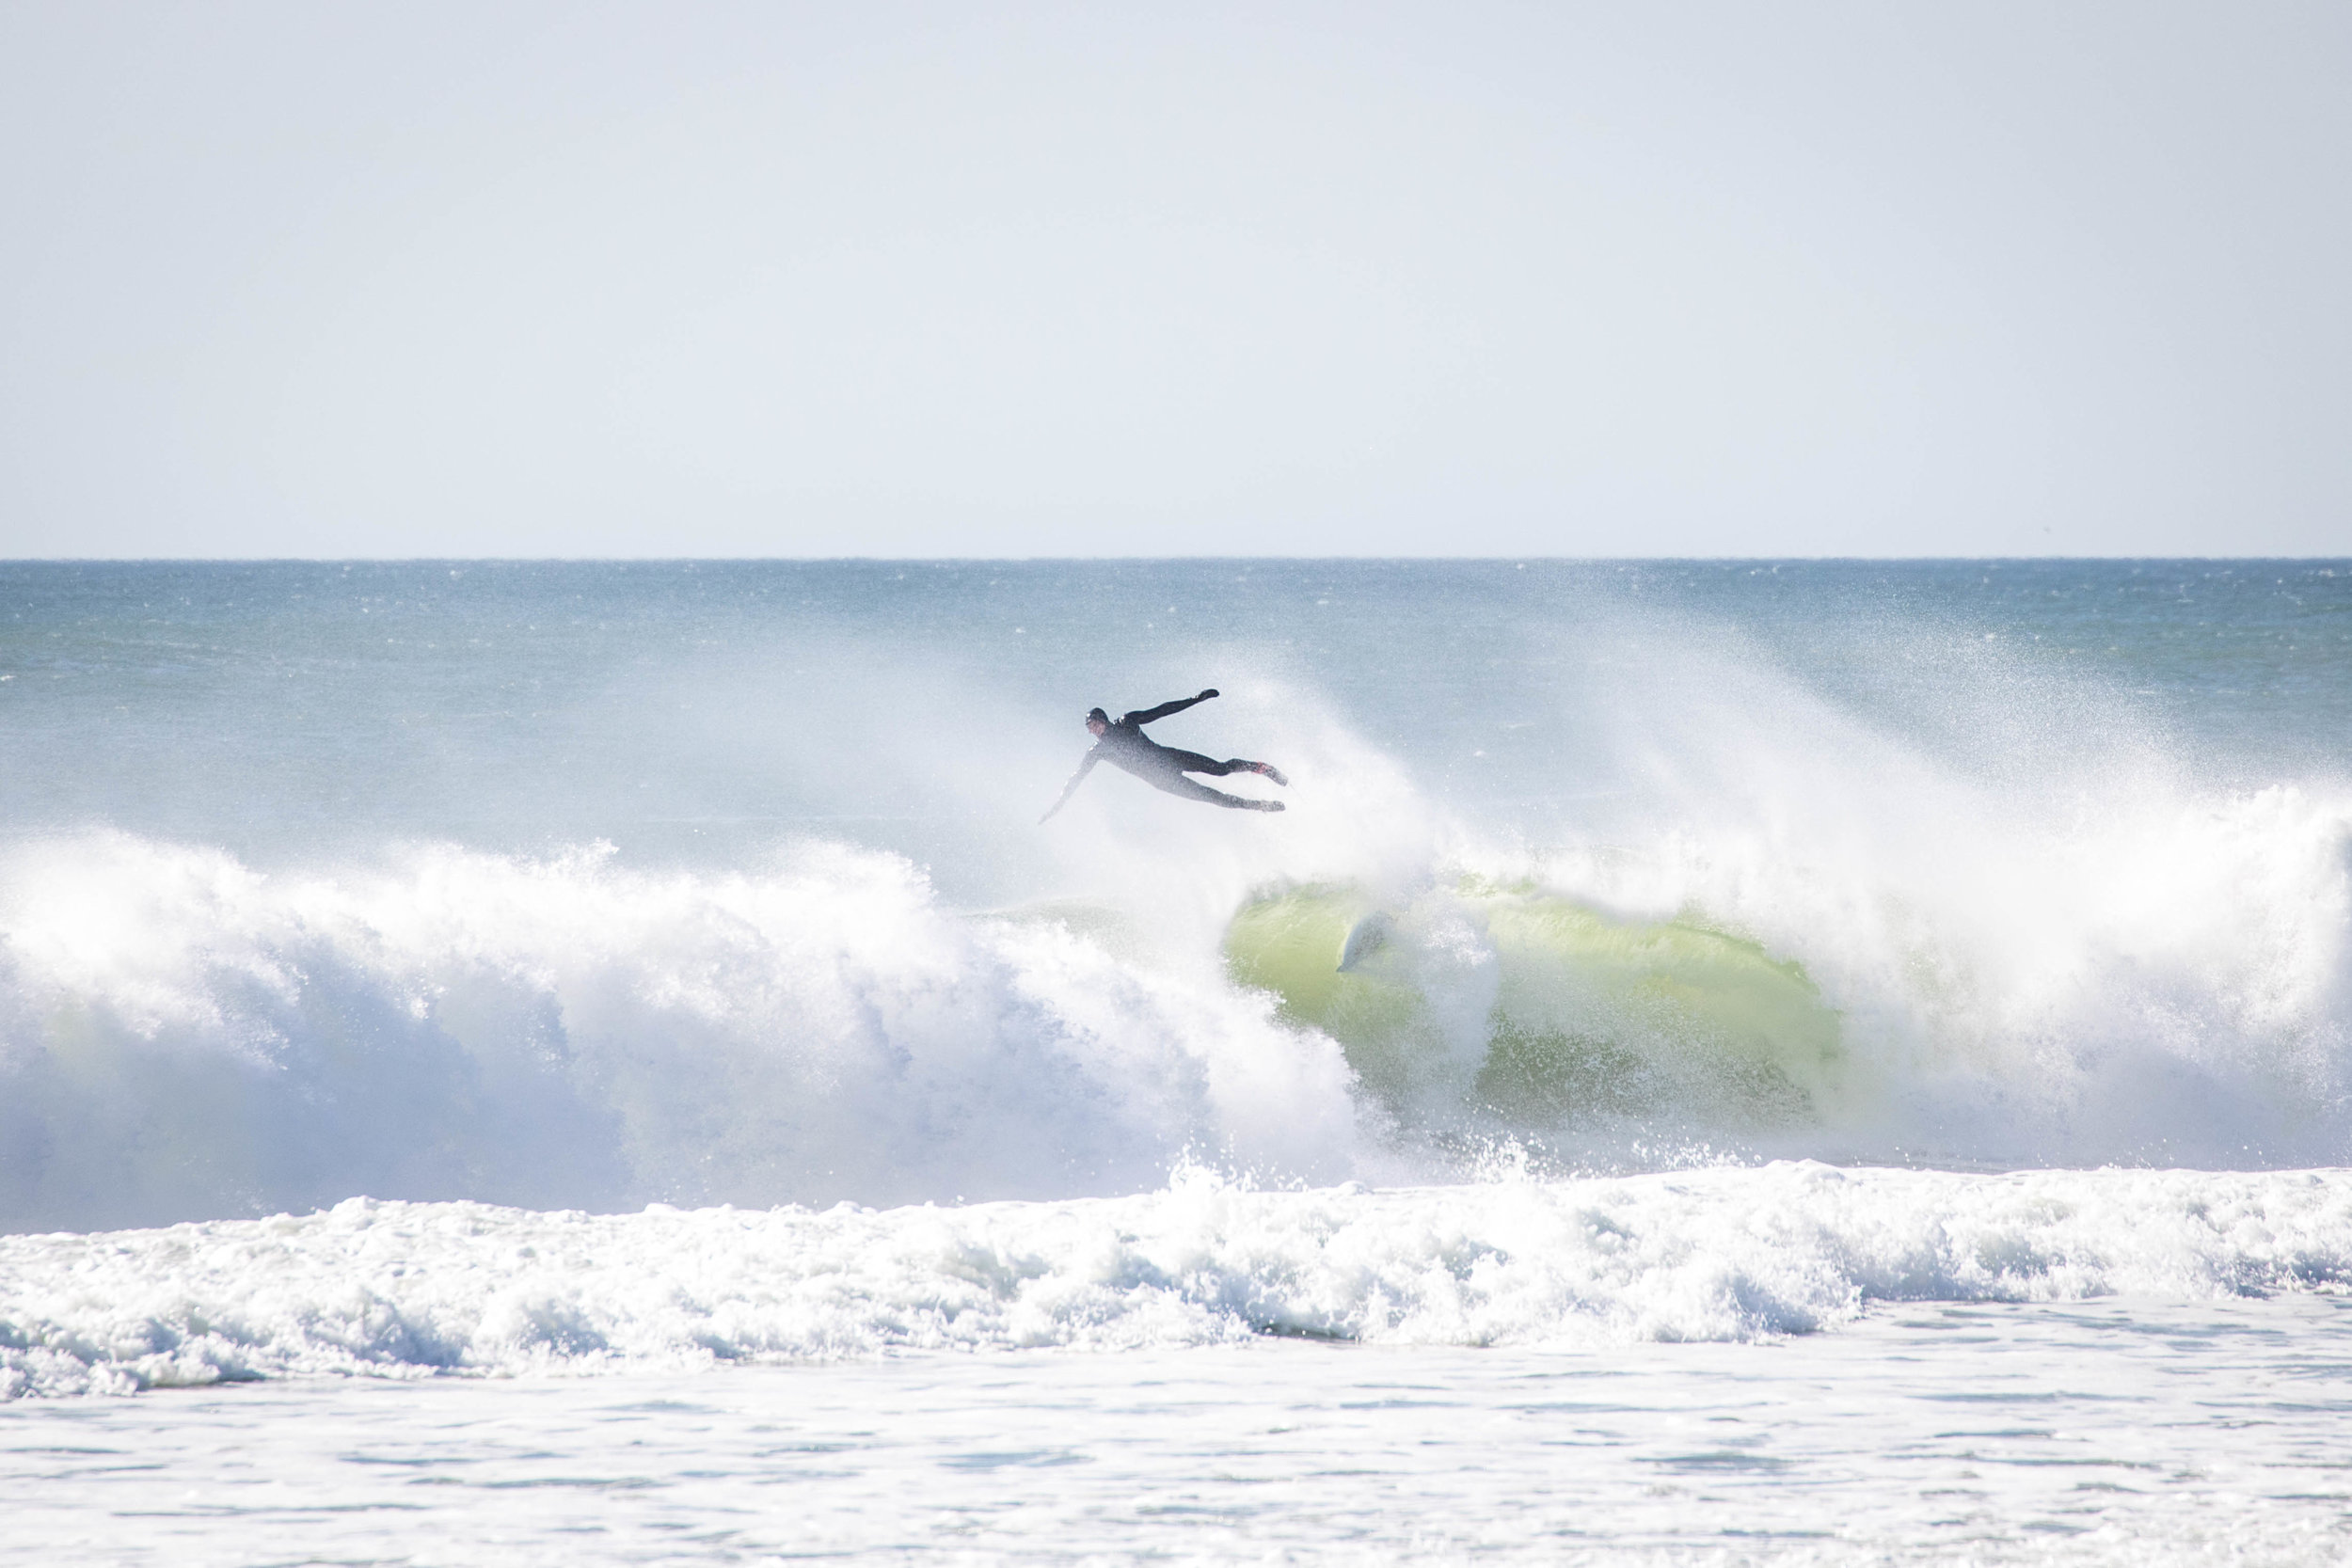 4-26-18 Mantoloking Wave 53.jpg